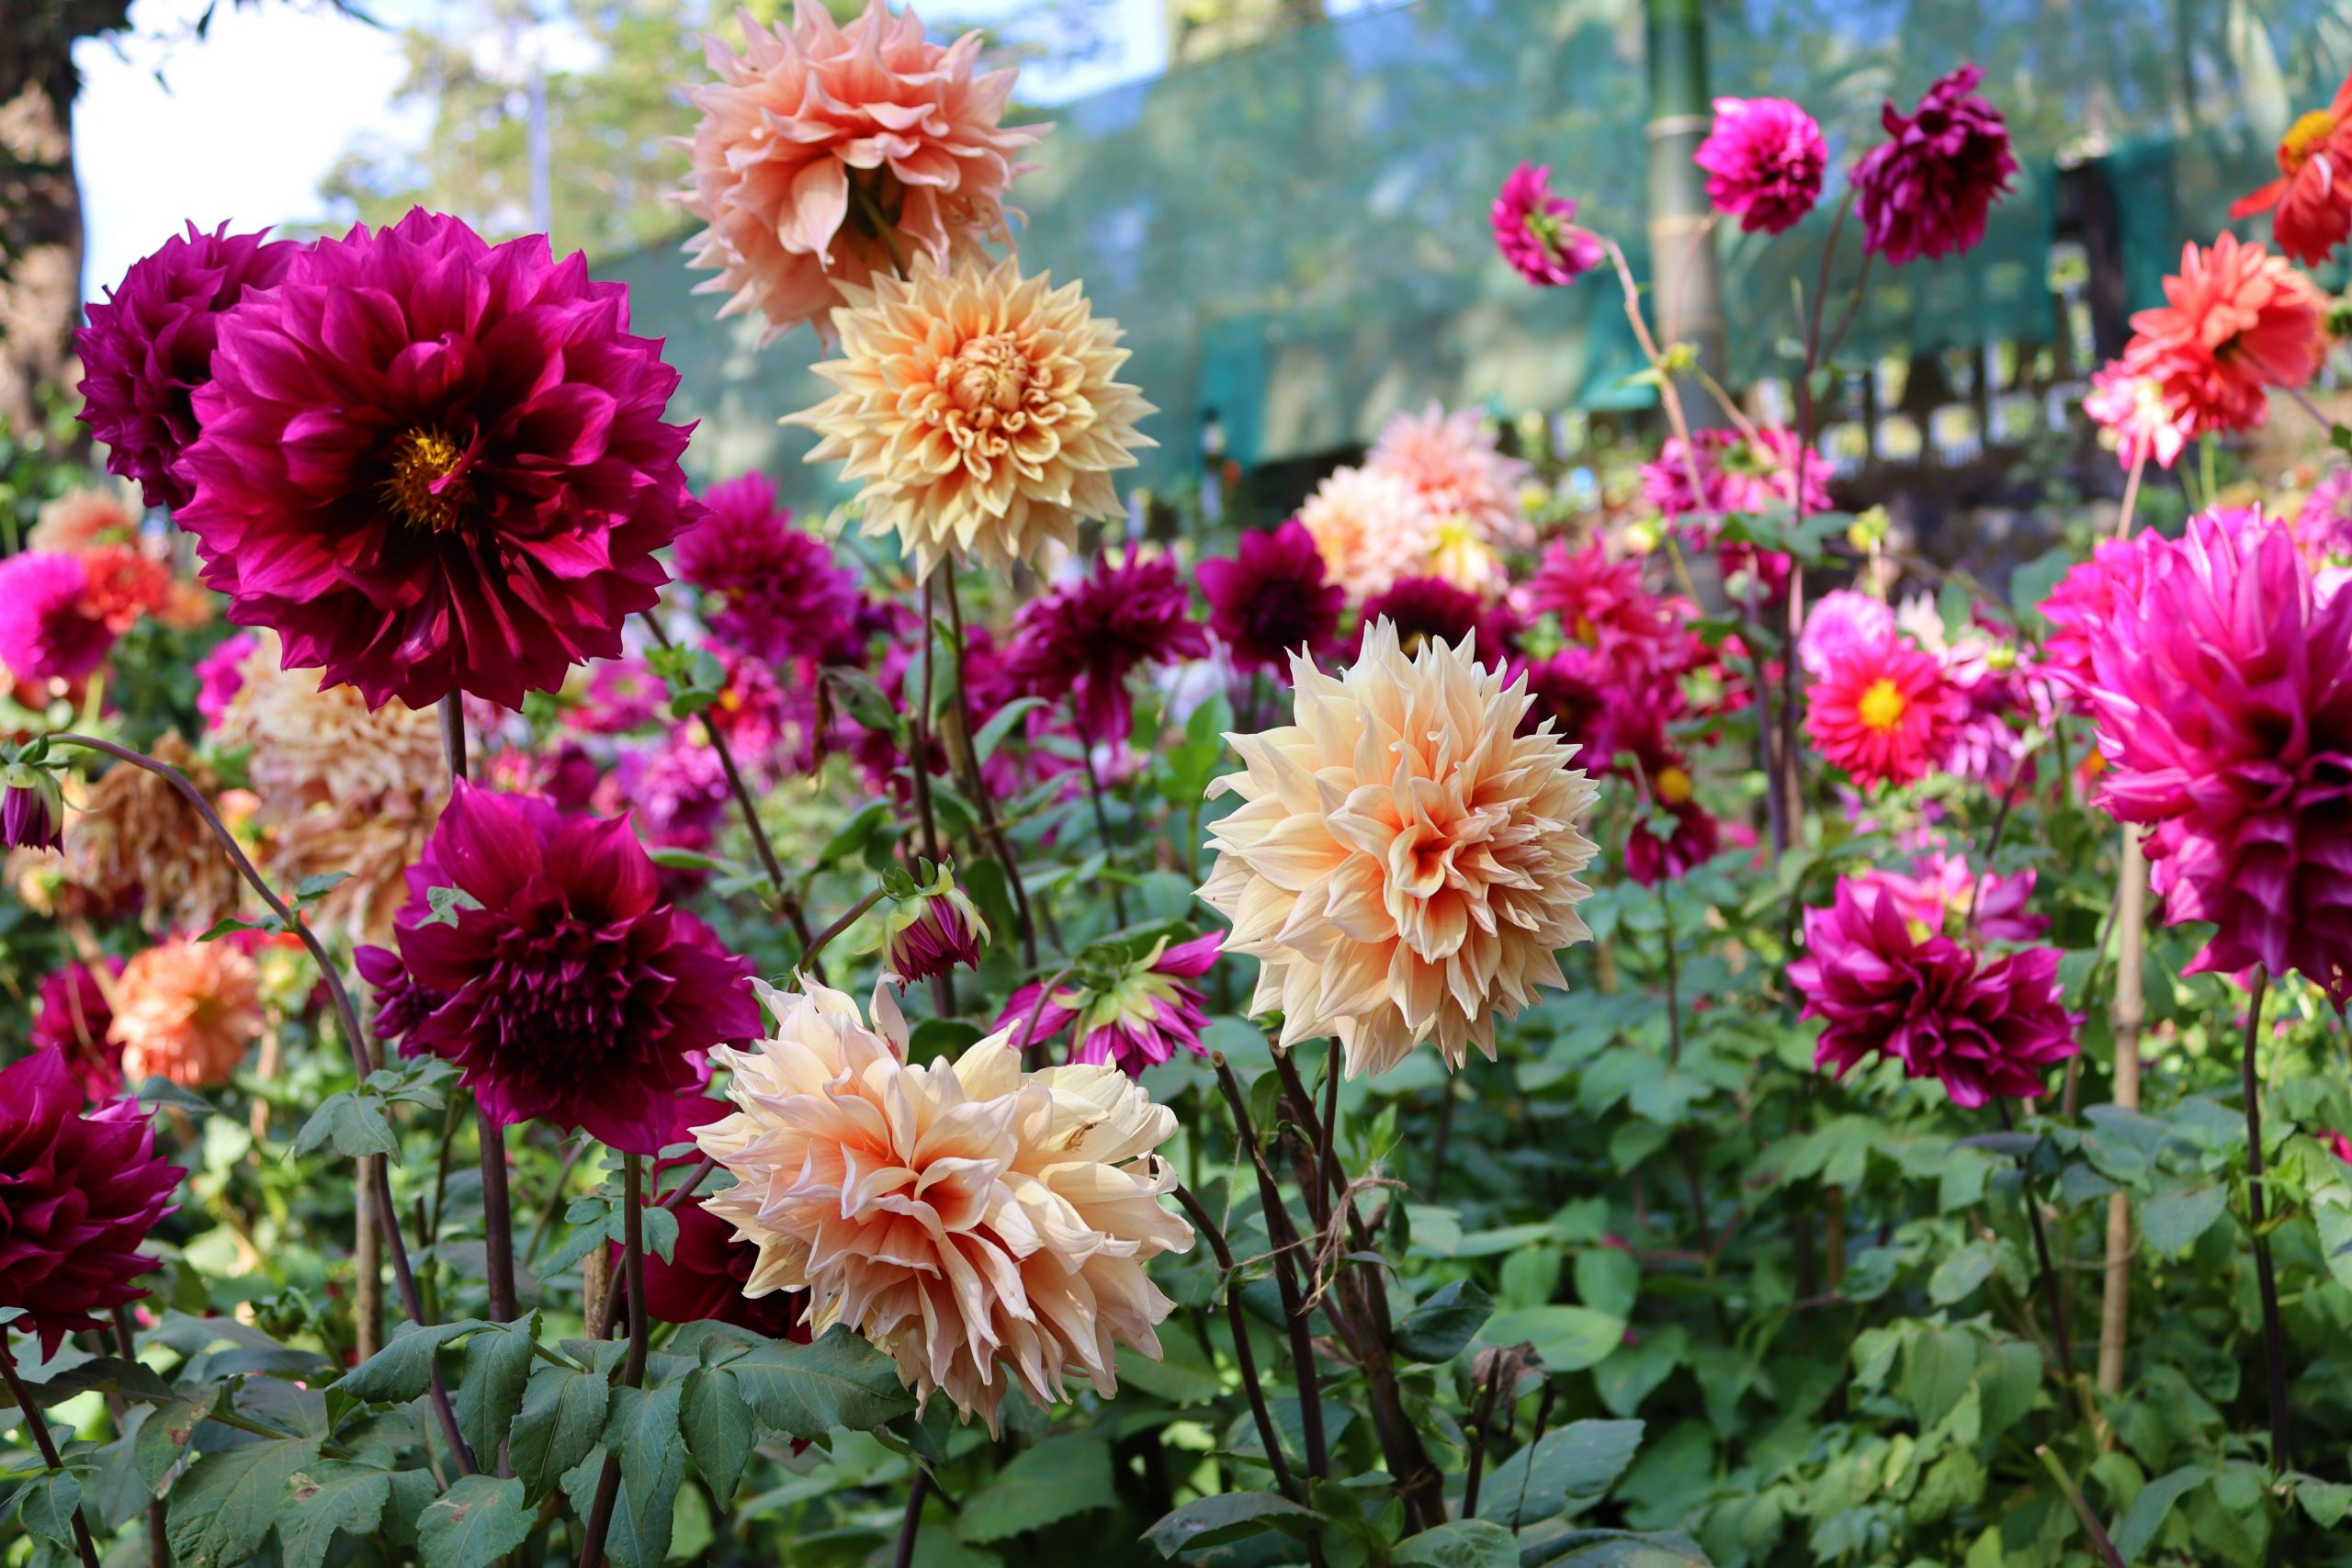 A bunch of Dahlia flowers in the garden